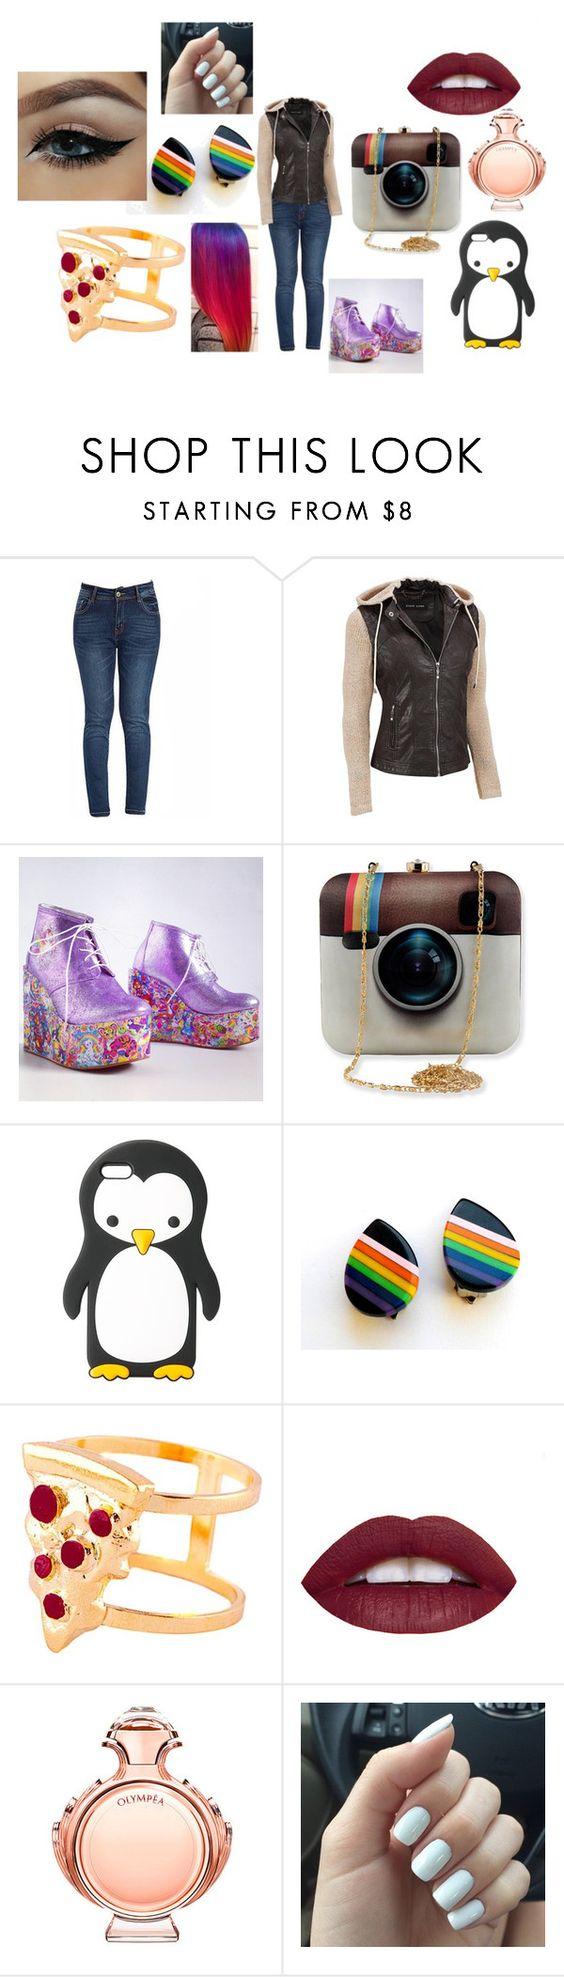 """Social Media"" by alliephil ❤ liked on Polyvore featuring moda, MANGO, Glenda López y Paco Rabanne"